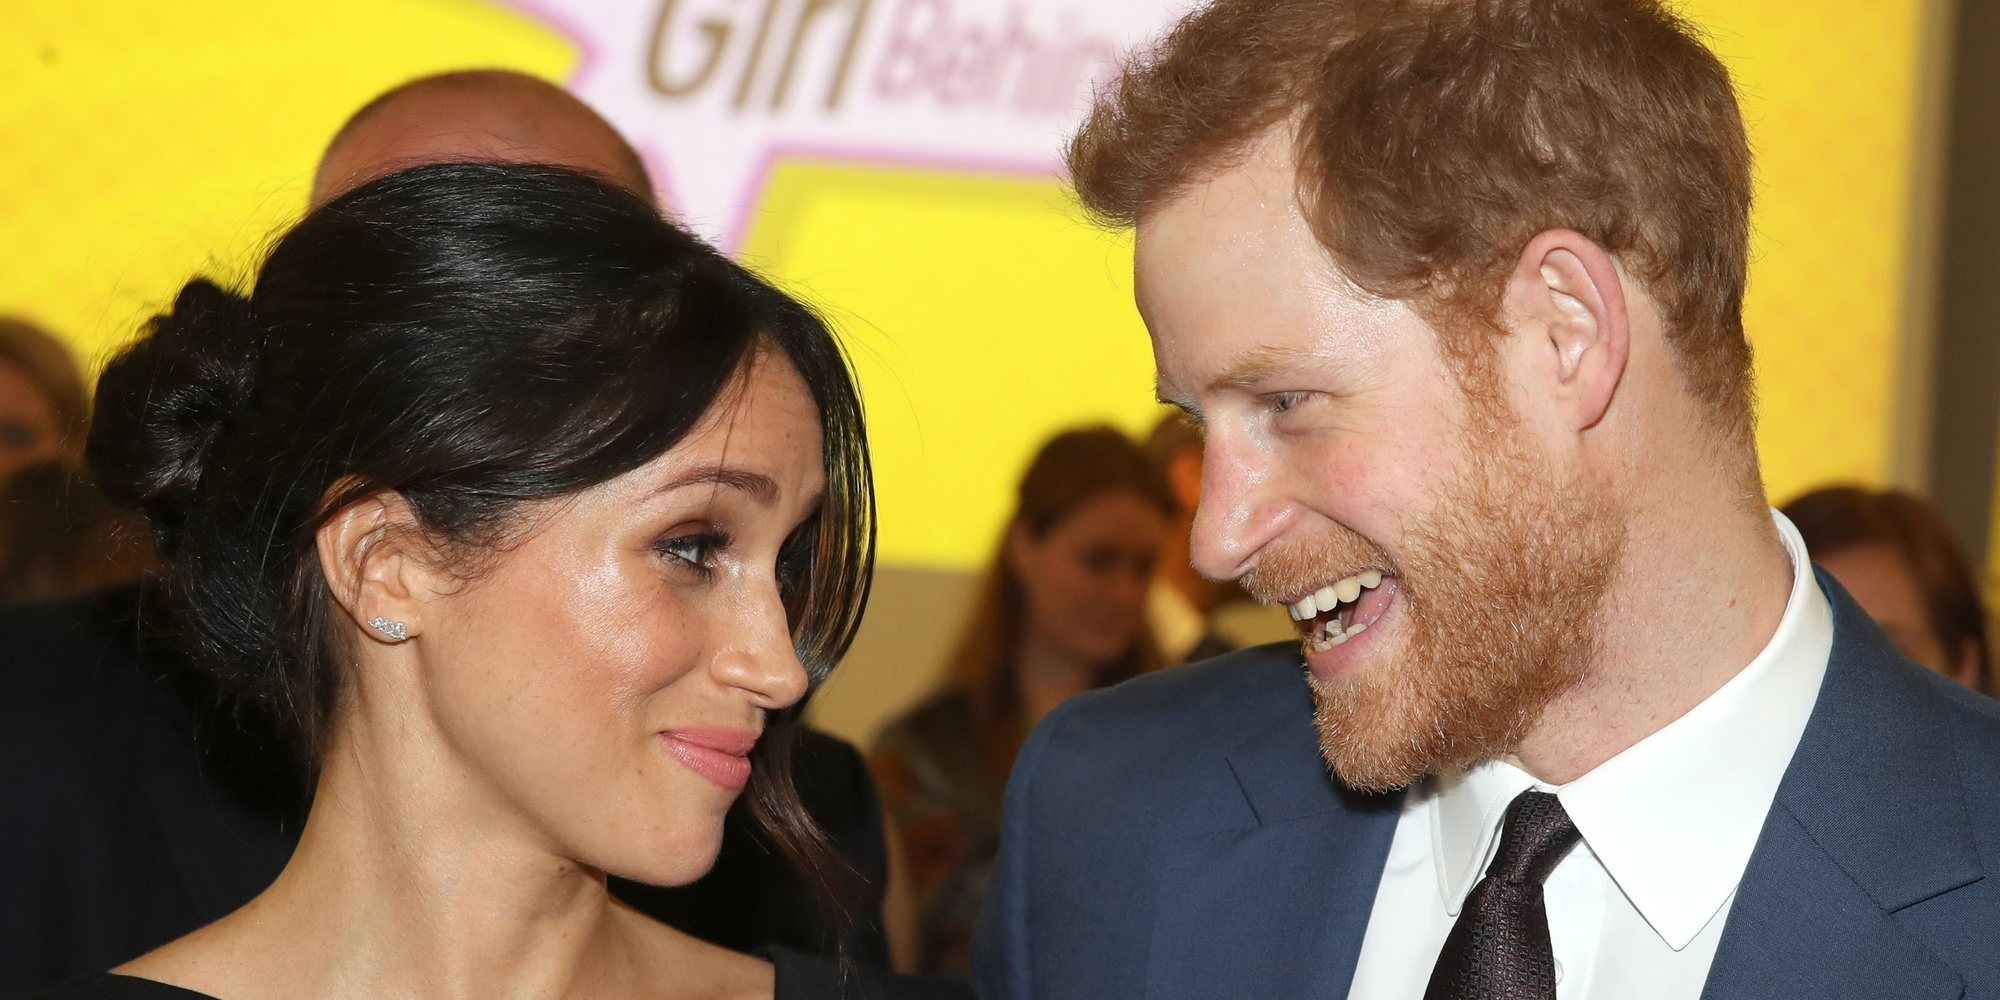 Meghan Markle pone a dieta al Príncipe Harry antes de la boda